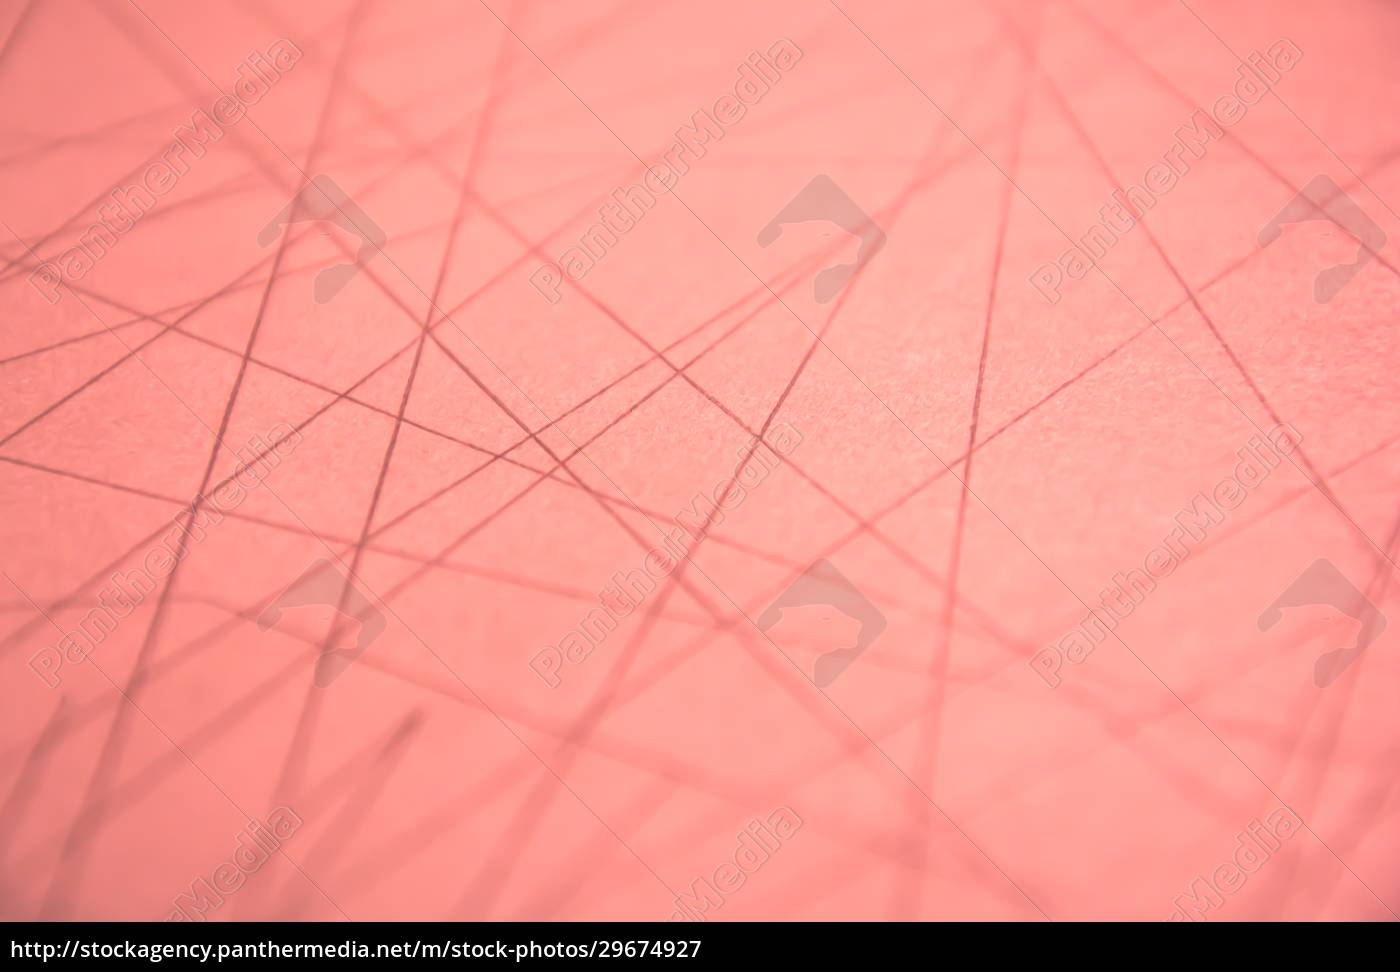 fondo, de, línea, abstracta - 29674927